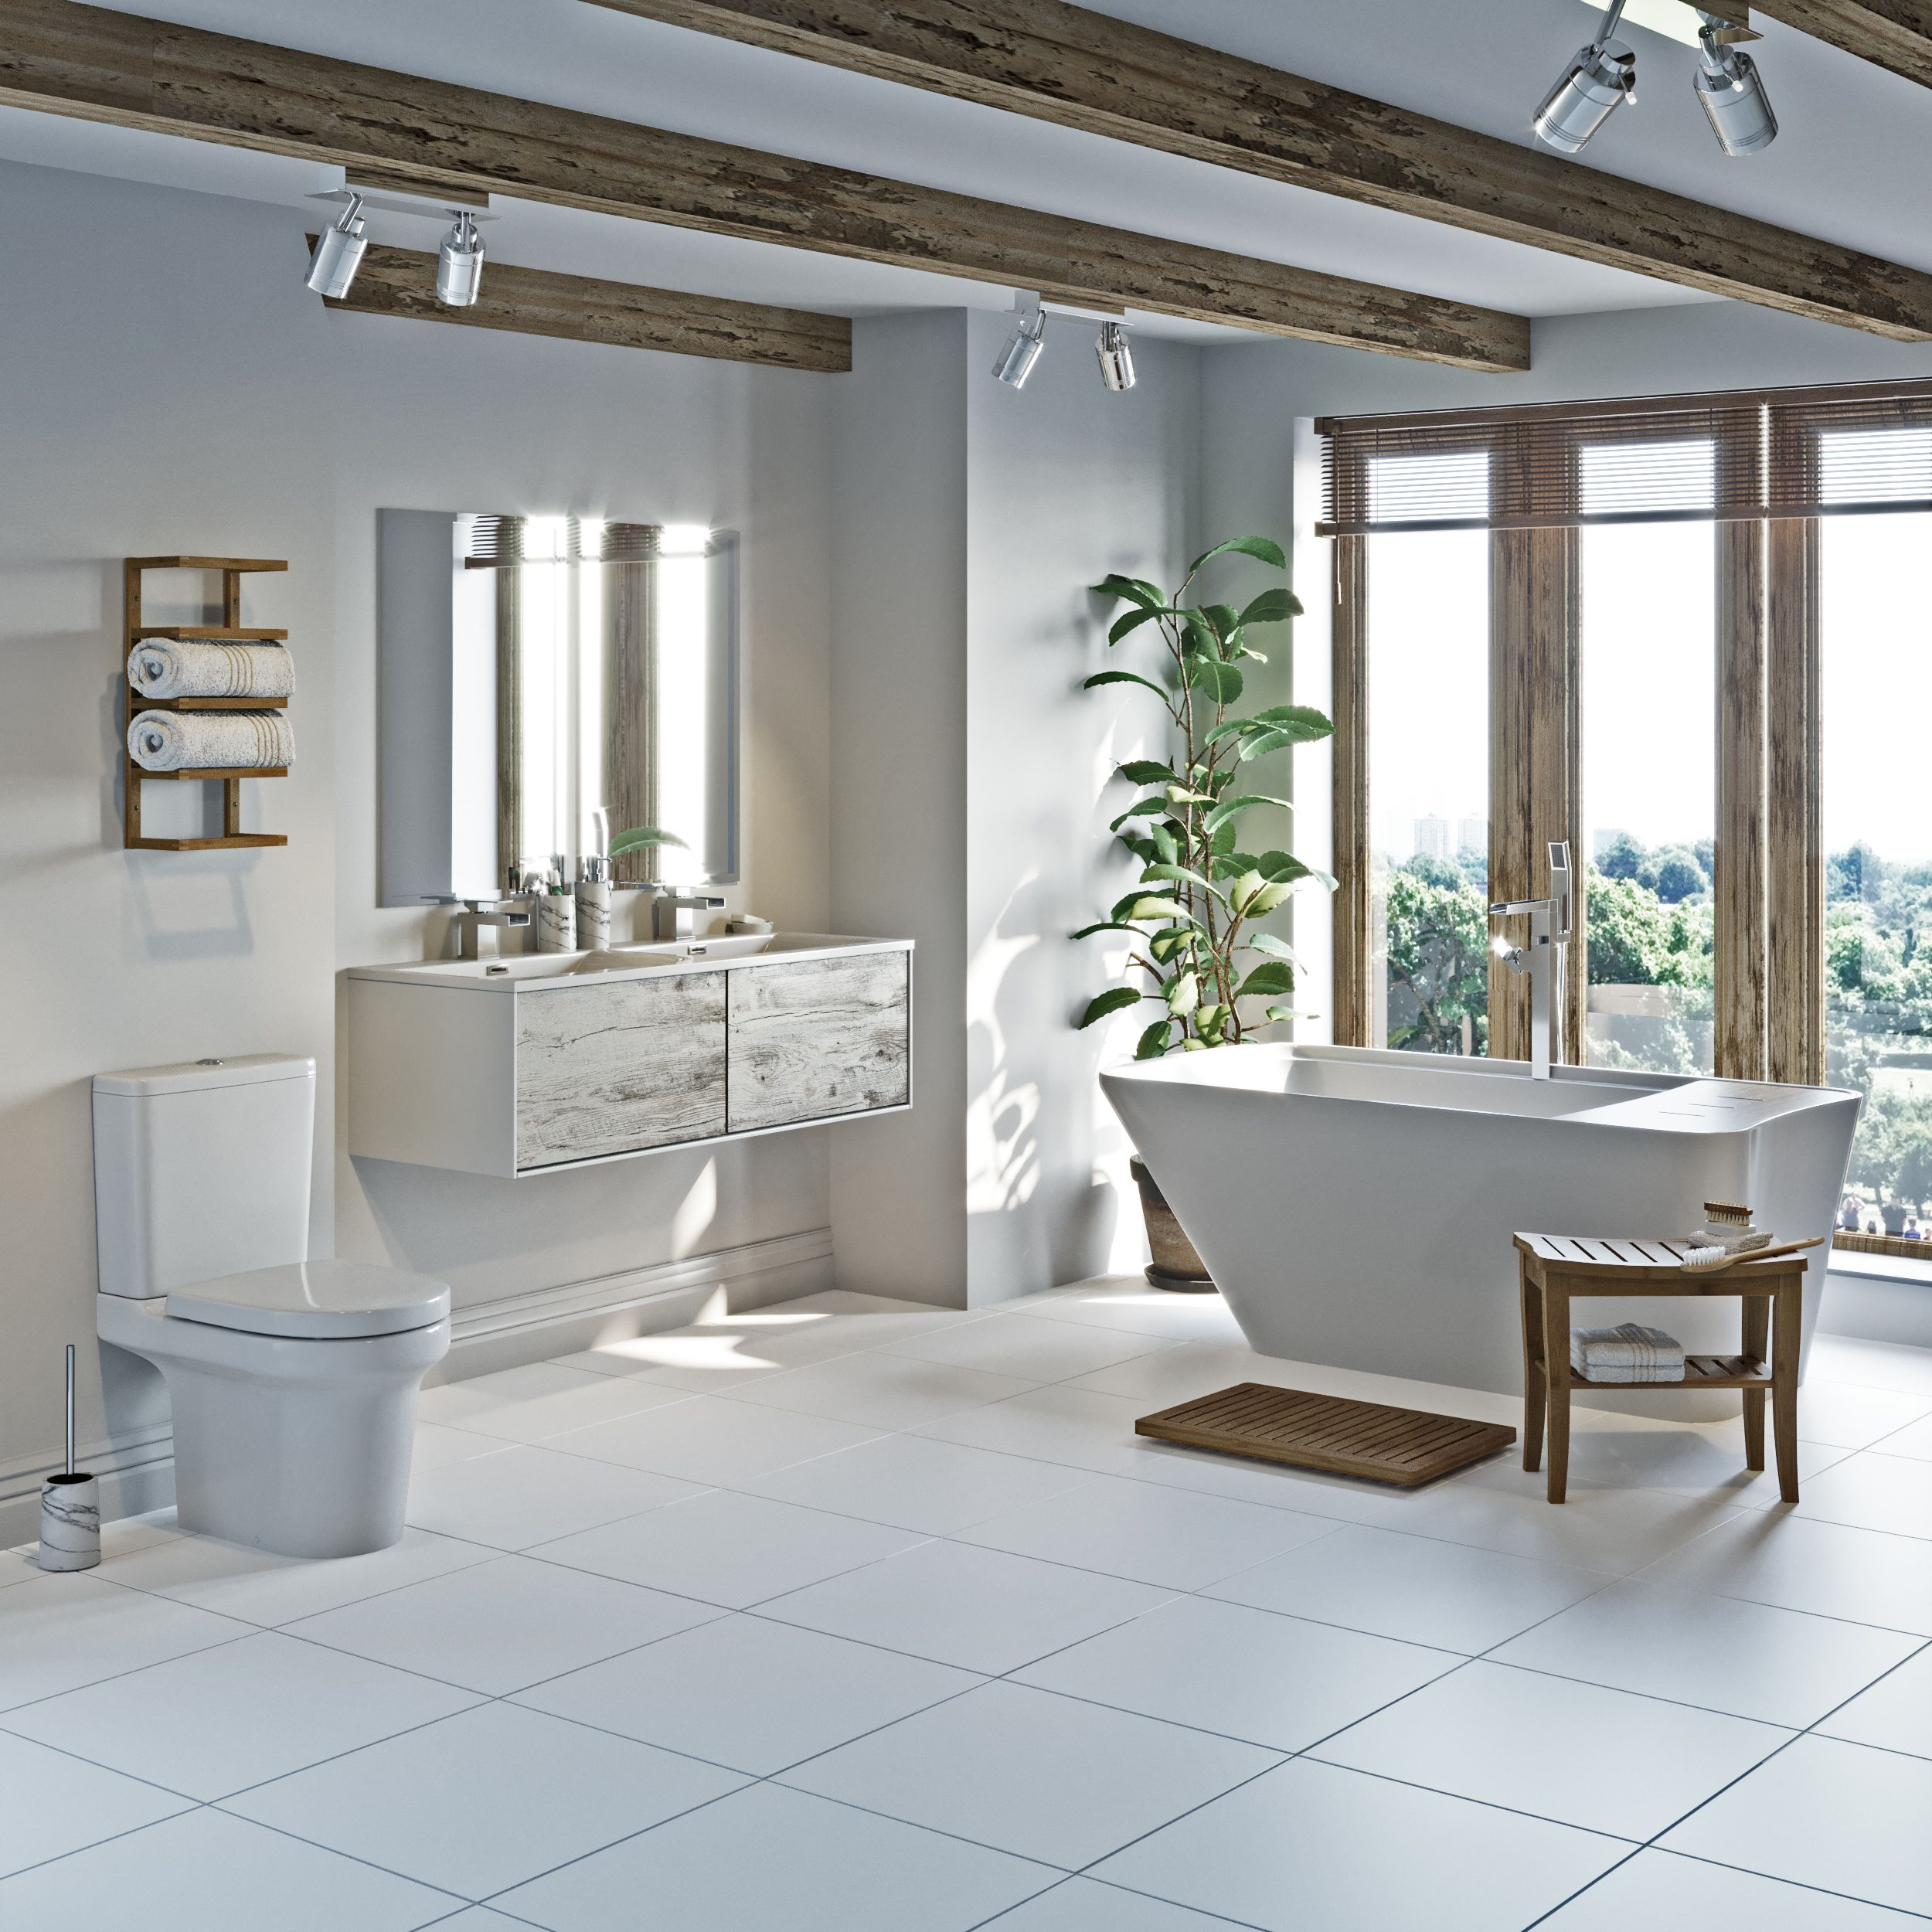 Natural Elements inspired bathroom by VictoriaPlum.com ... on organic mirrors, international bathroom design, light bathroom design, reclaimed bathrooms design, geometric bathroom design, old hollywood bathroom design, pebble bathroom design, hipster bathroom design, bathroom interior design, indian bathroom design, themed bathroom design, functional bathroom design, wood bathroom design, gold bathroom design, chocolate bathroom design, sustainable bathroom design, natural bathroom design, barn bathroom design, korean bathroom design, african bathroom design,